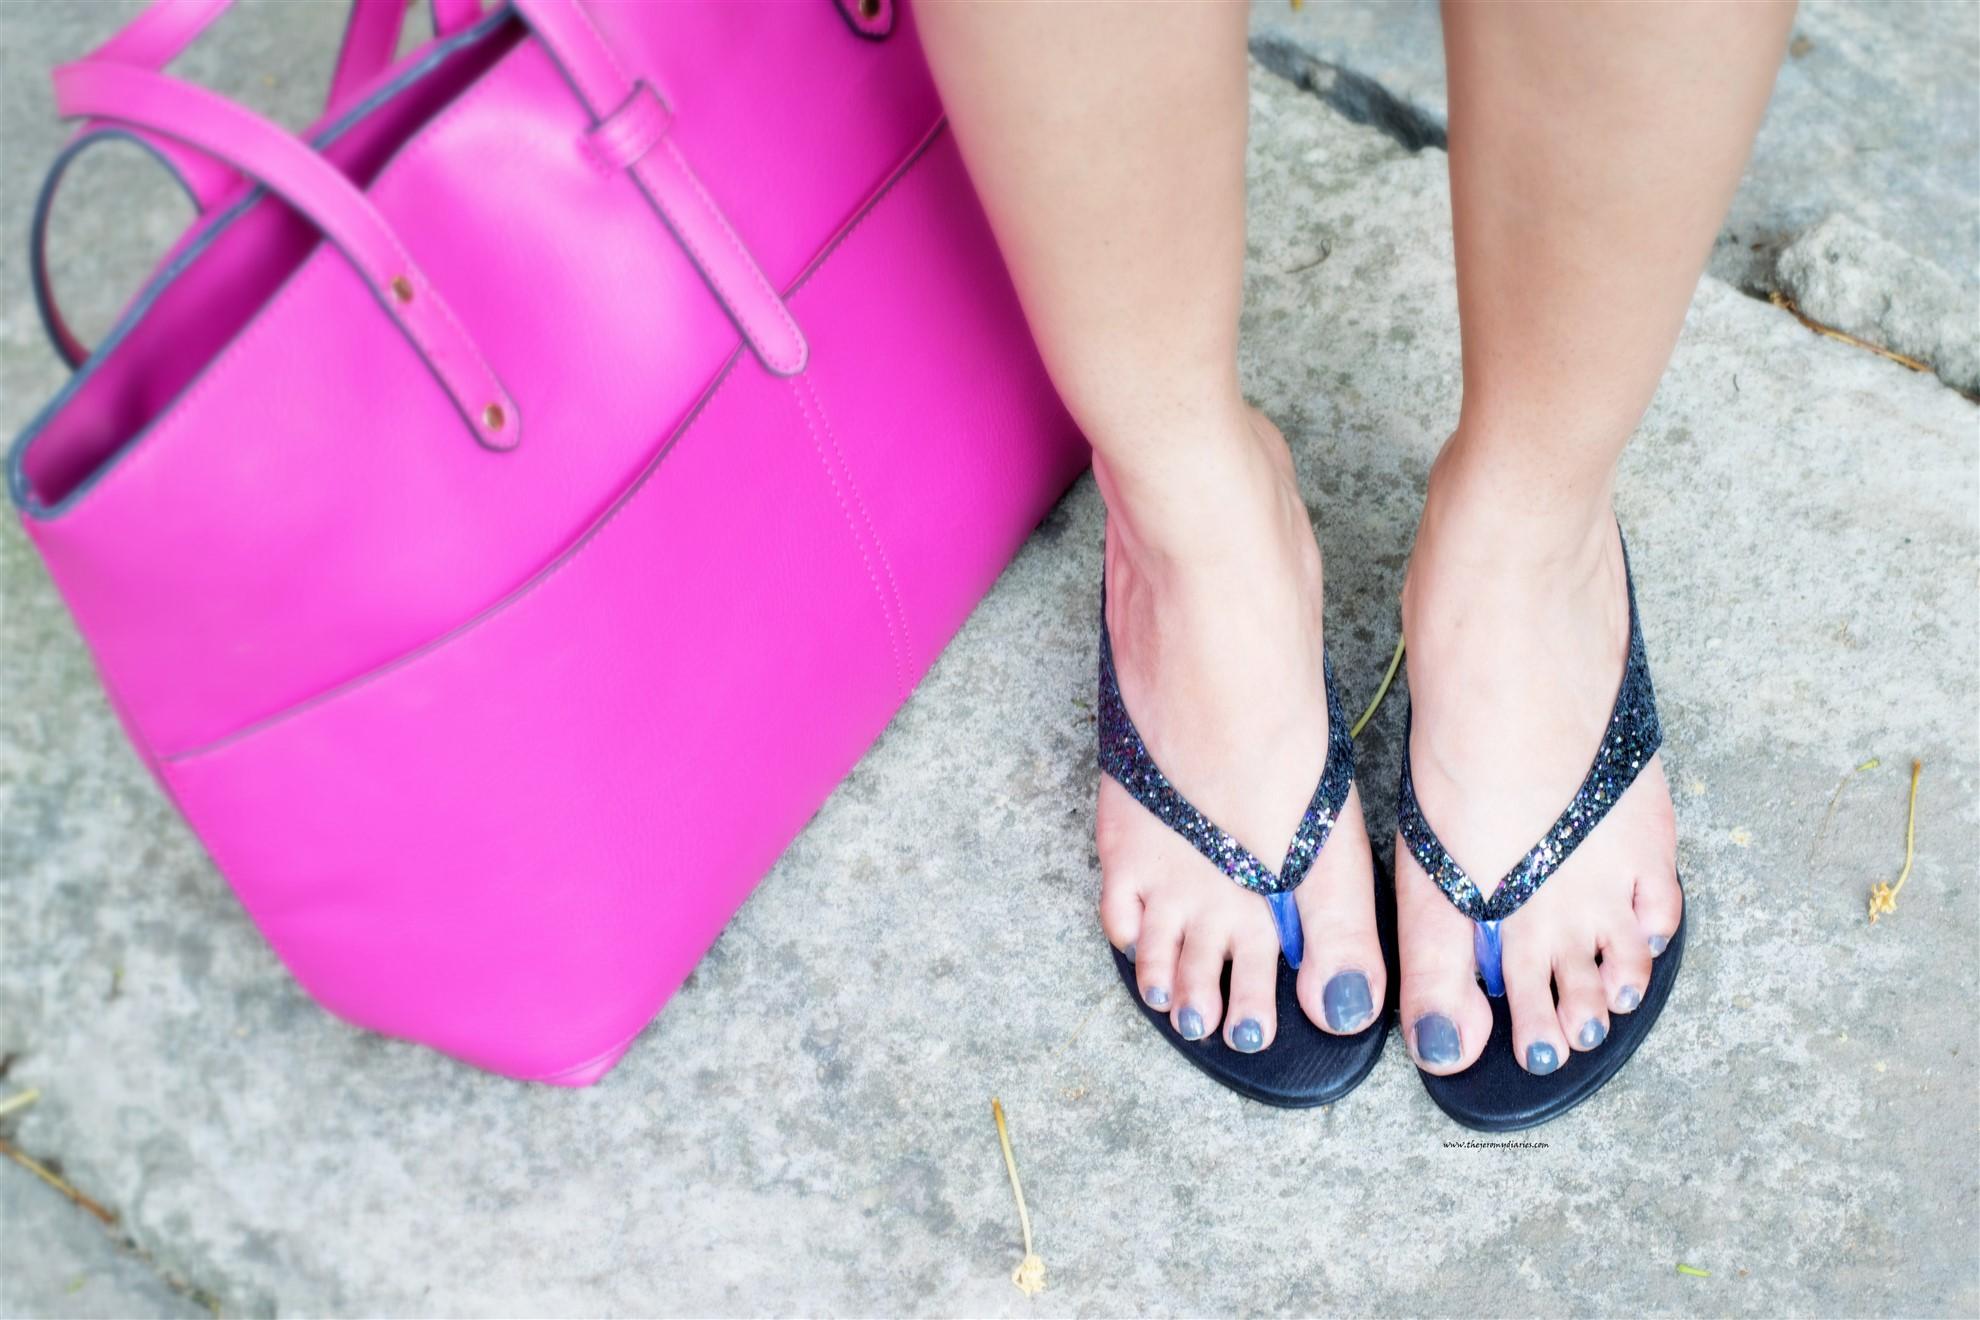 reliance-footprint-x-the-jeromy-diaries-fashion-blogger-princy-mascarenhas